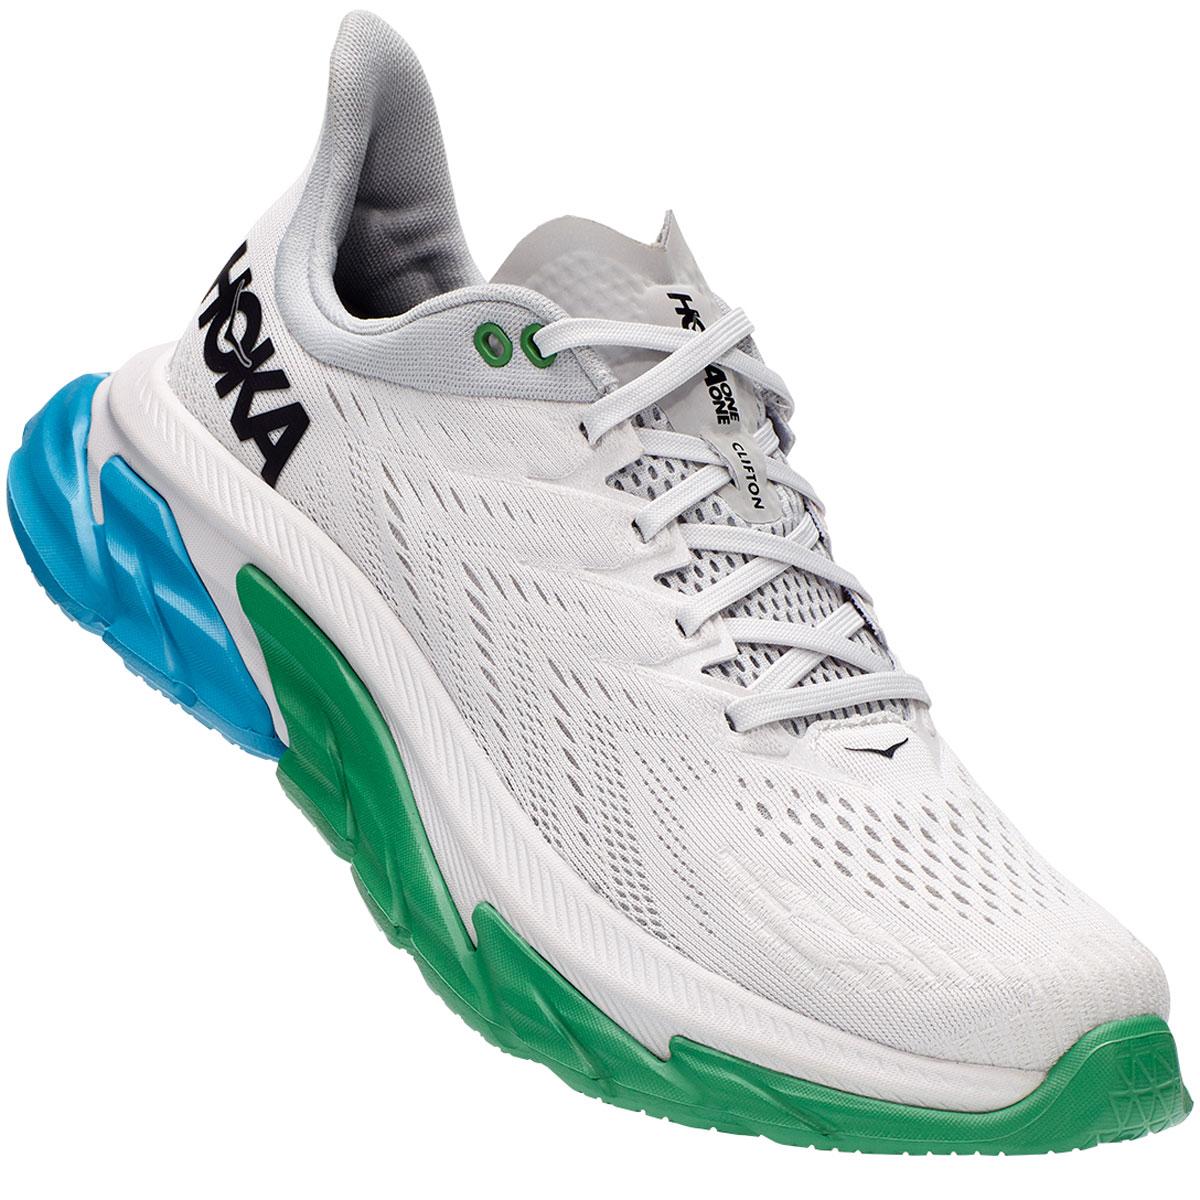 Men's Hoka One One Clifton Edge Running Shoe - Color: Nimbus Cloud - Size: 7 - Width: Regular, Nimbus Cloud, large, image 4